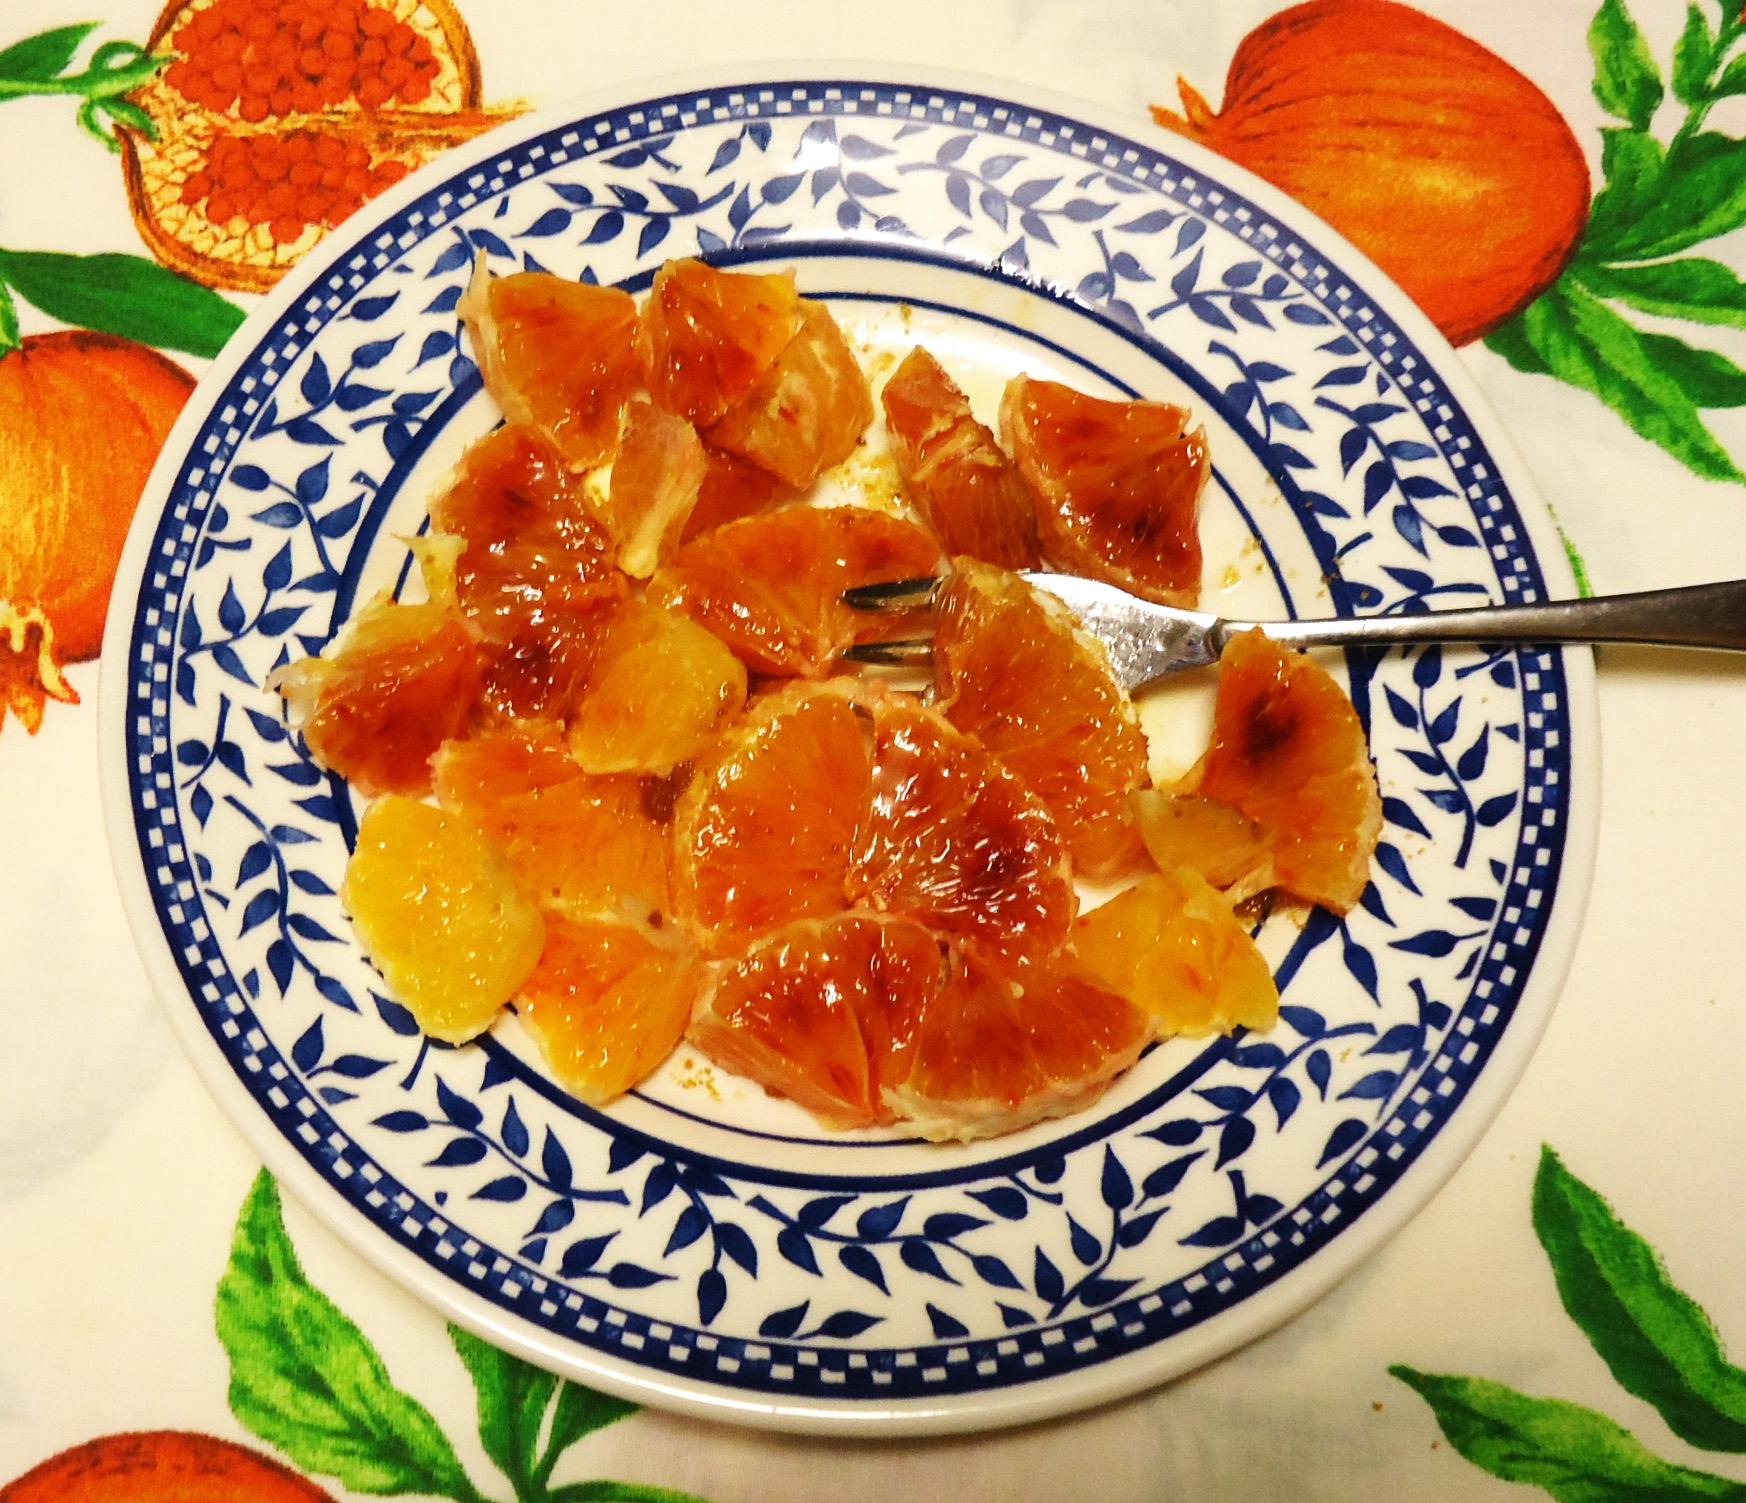 arancia condita per merenda